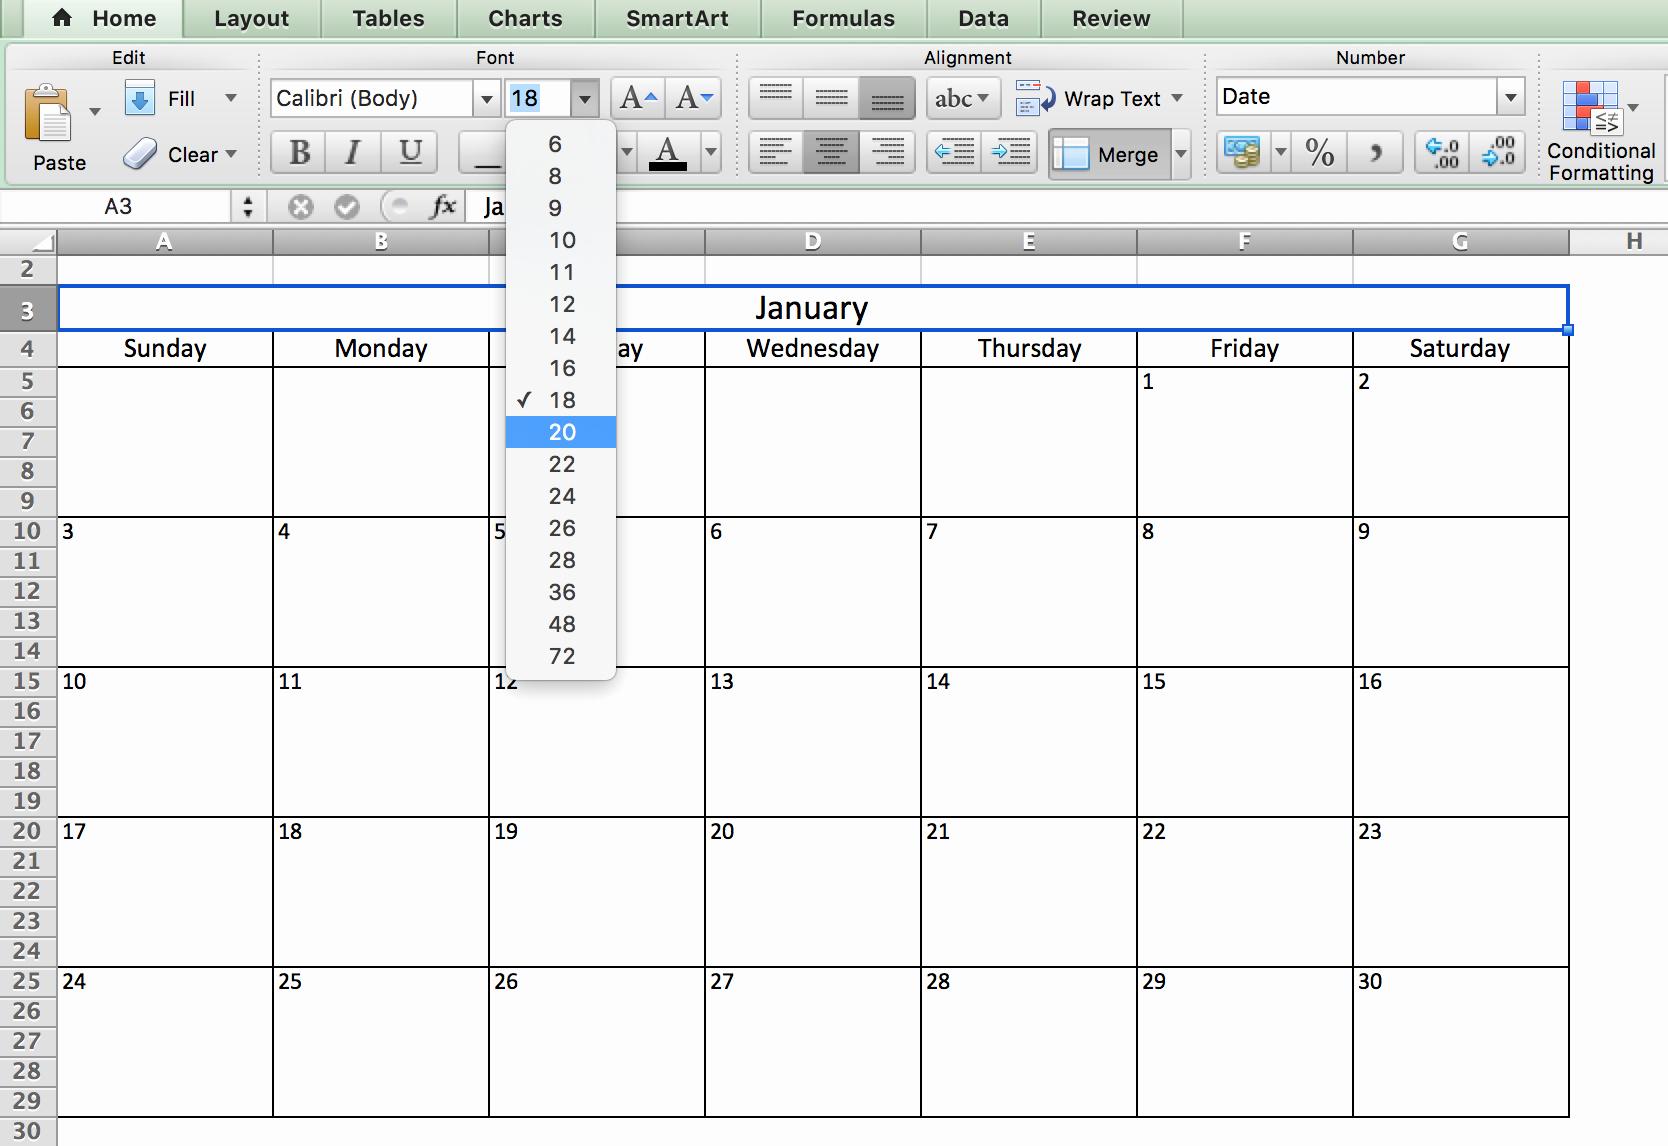 Excel Calendar Schedule Template Luxury Make A 2018 Calendar In Excel Includes Free Template